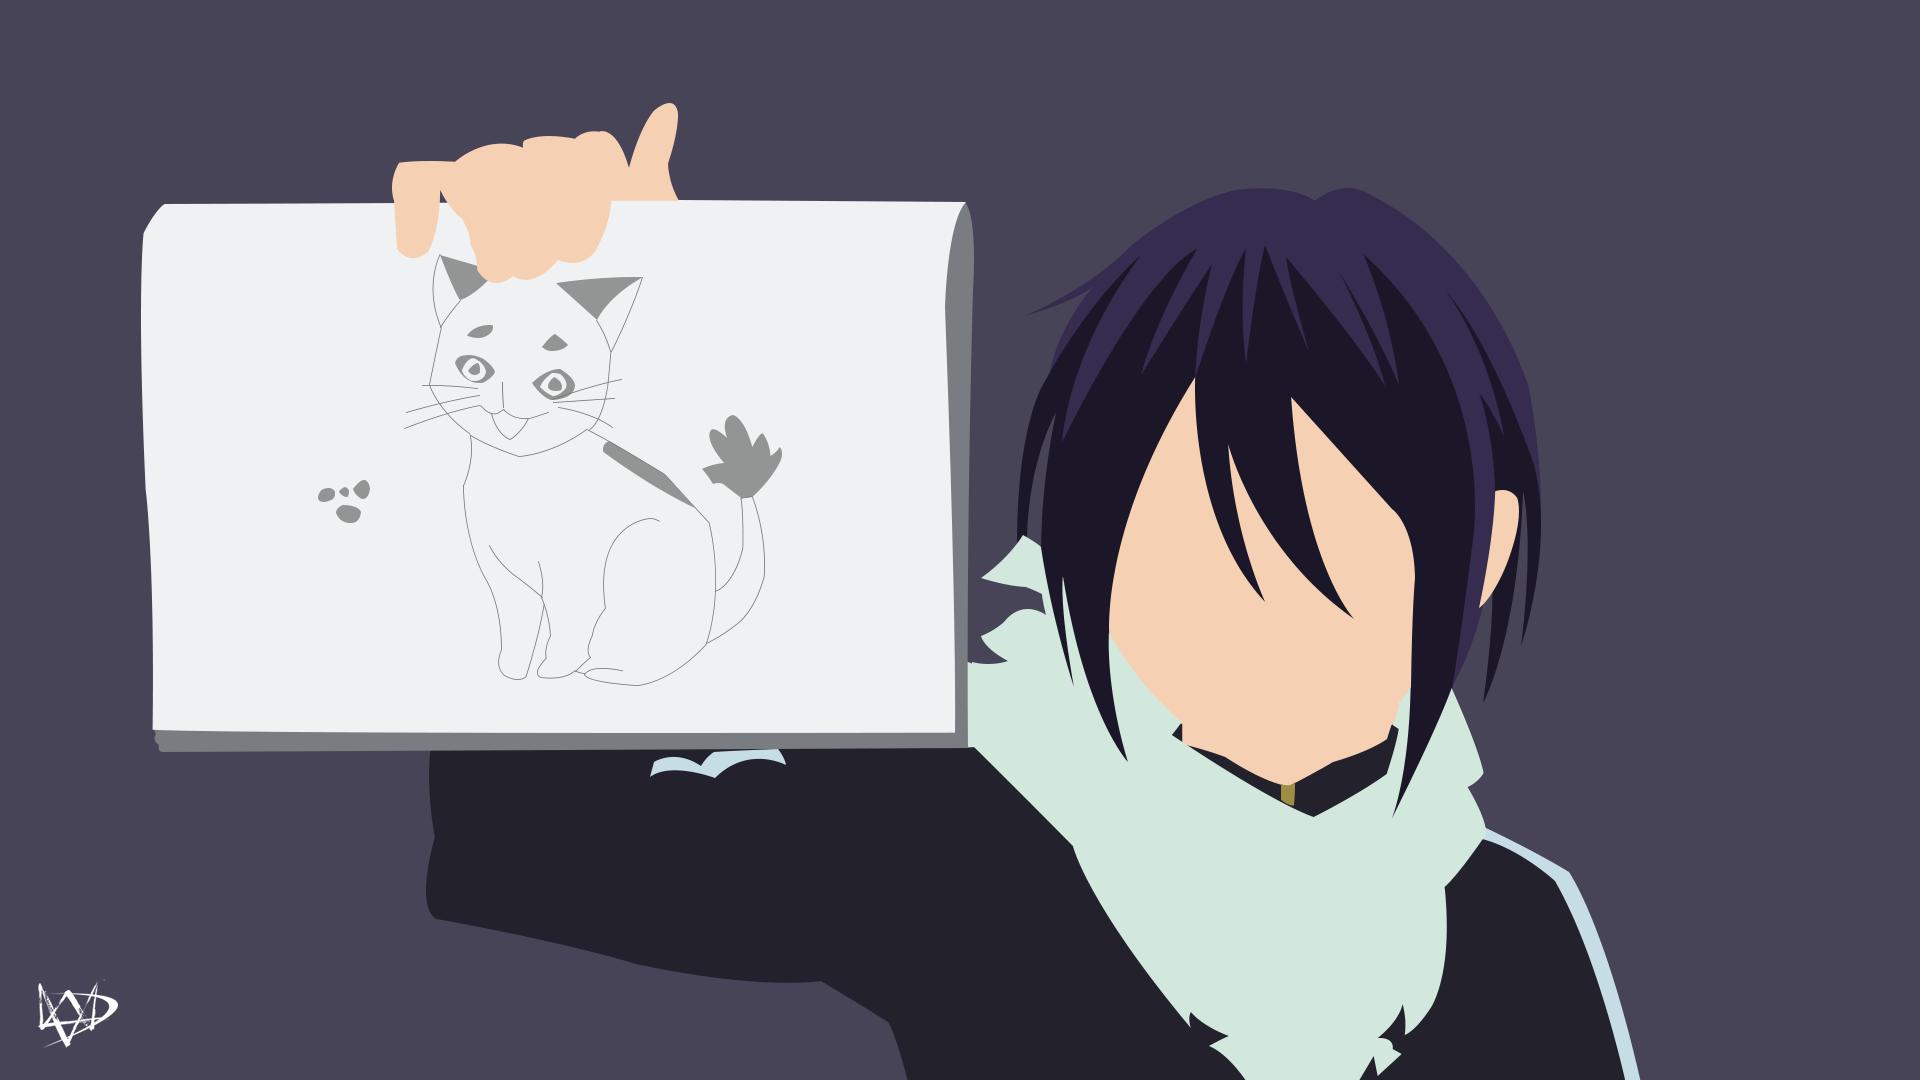 Monokuma (Danganronpa) Minimalist Anime Wallpaper by